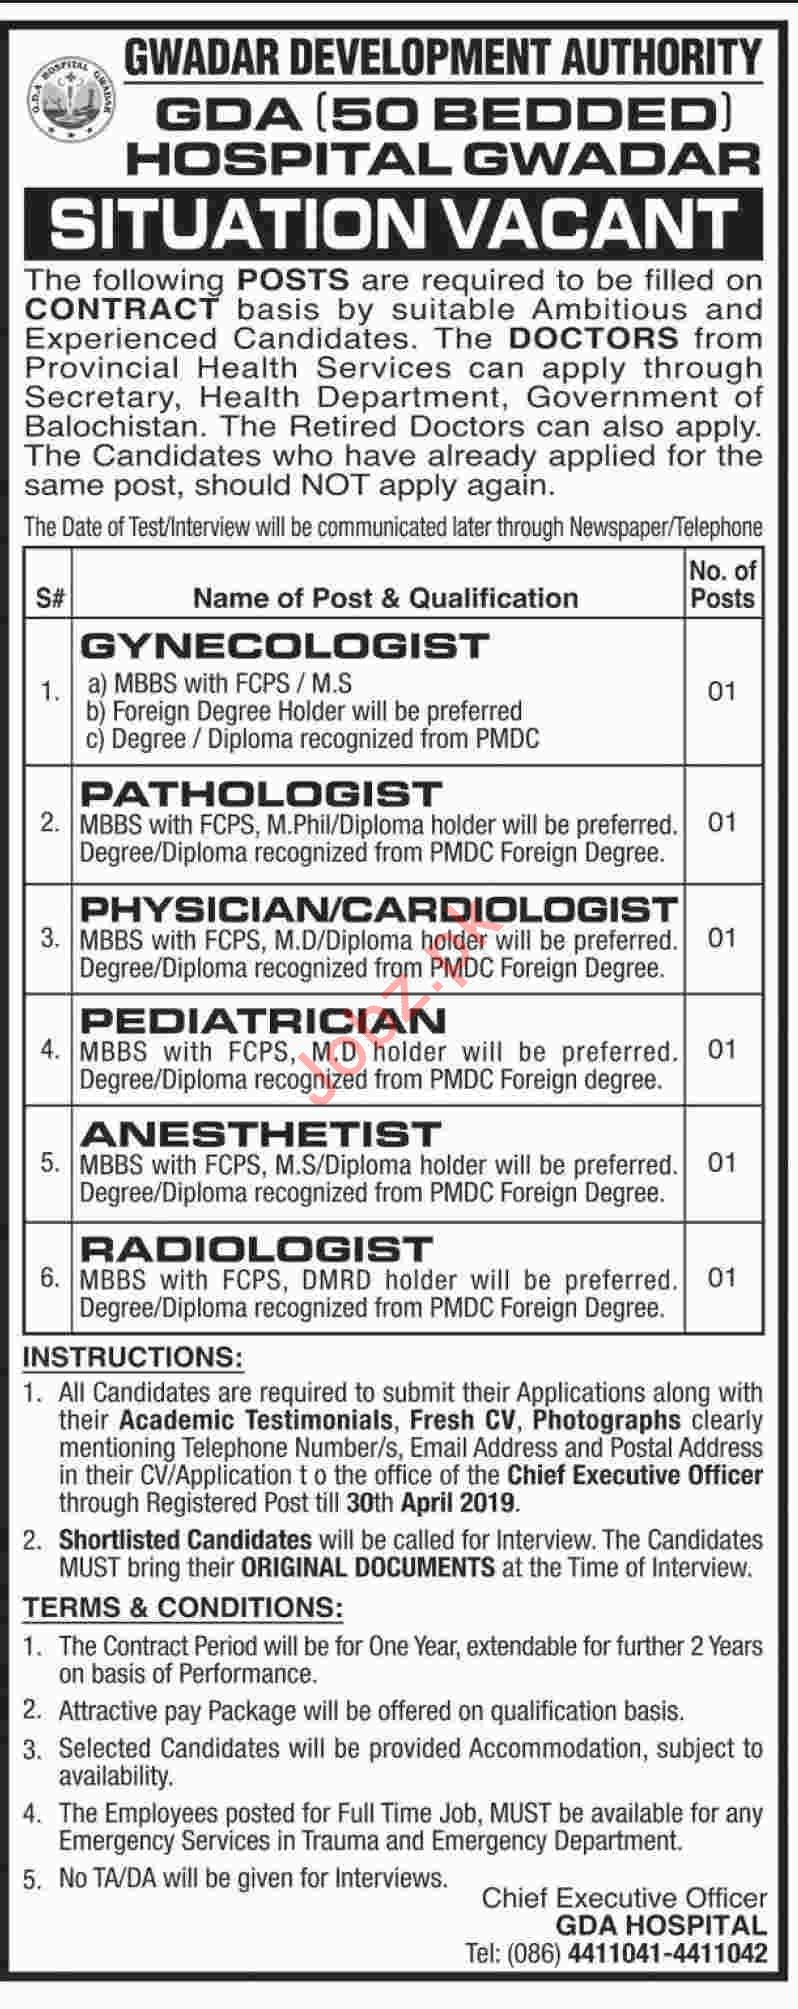 Gwadar Development Authority GDA Hospital Doctors Jobs